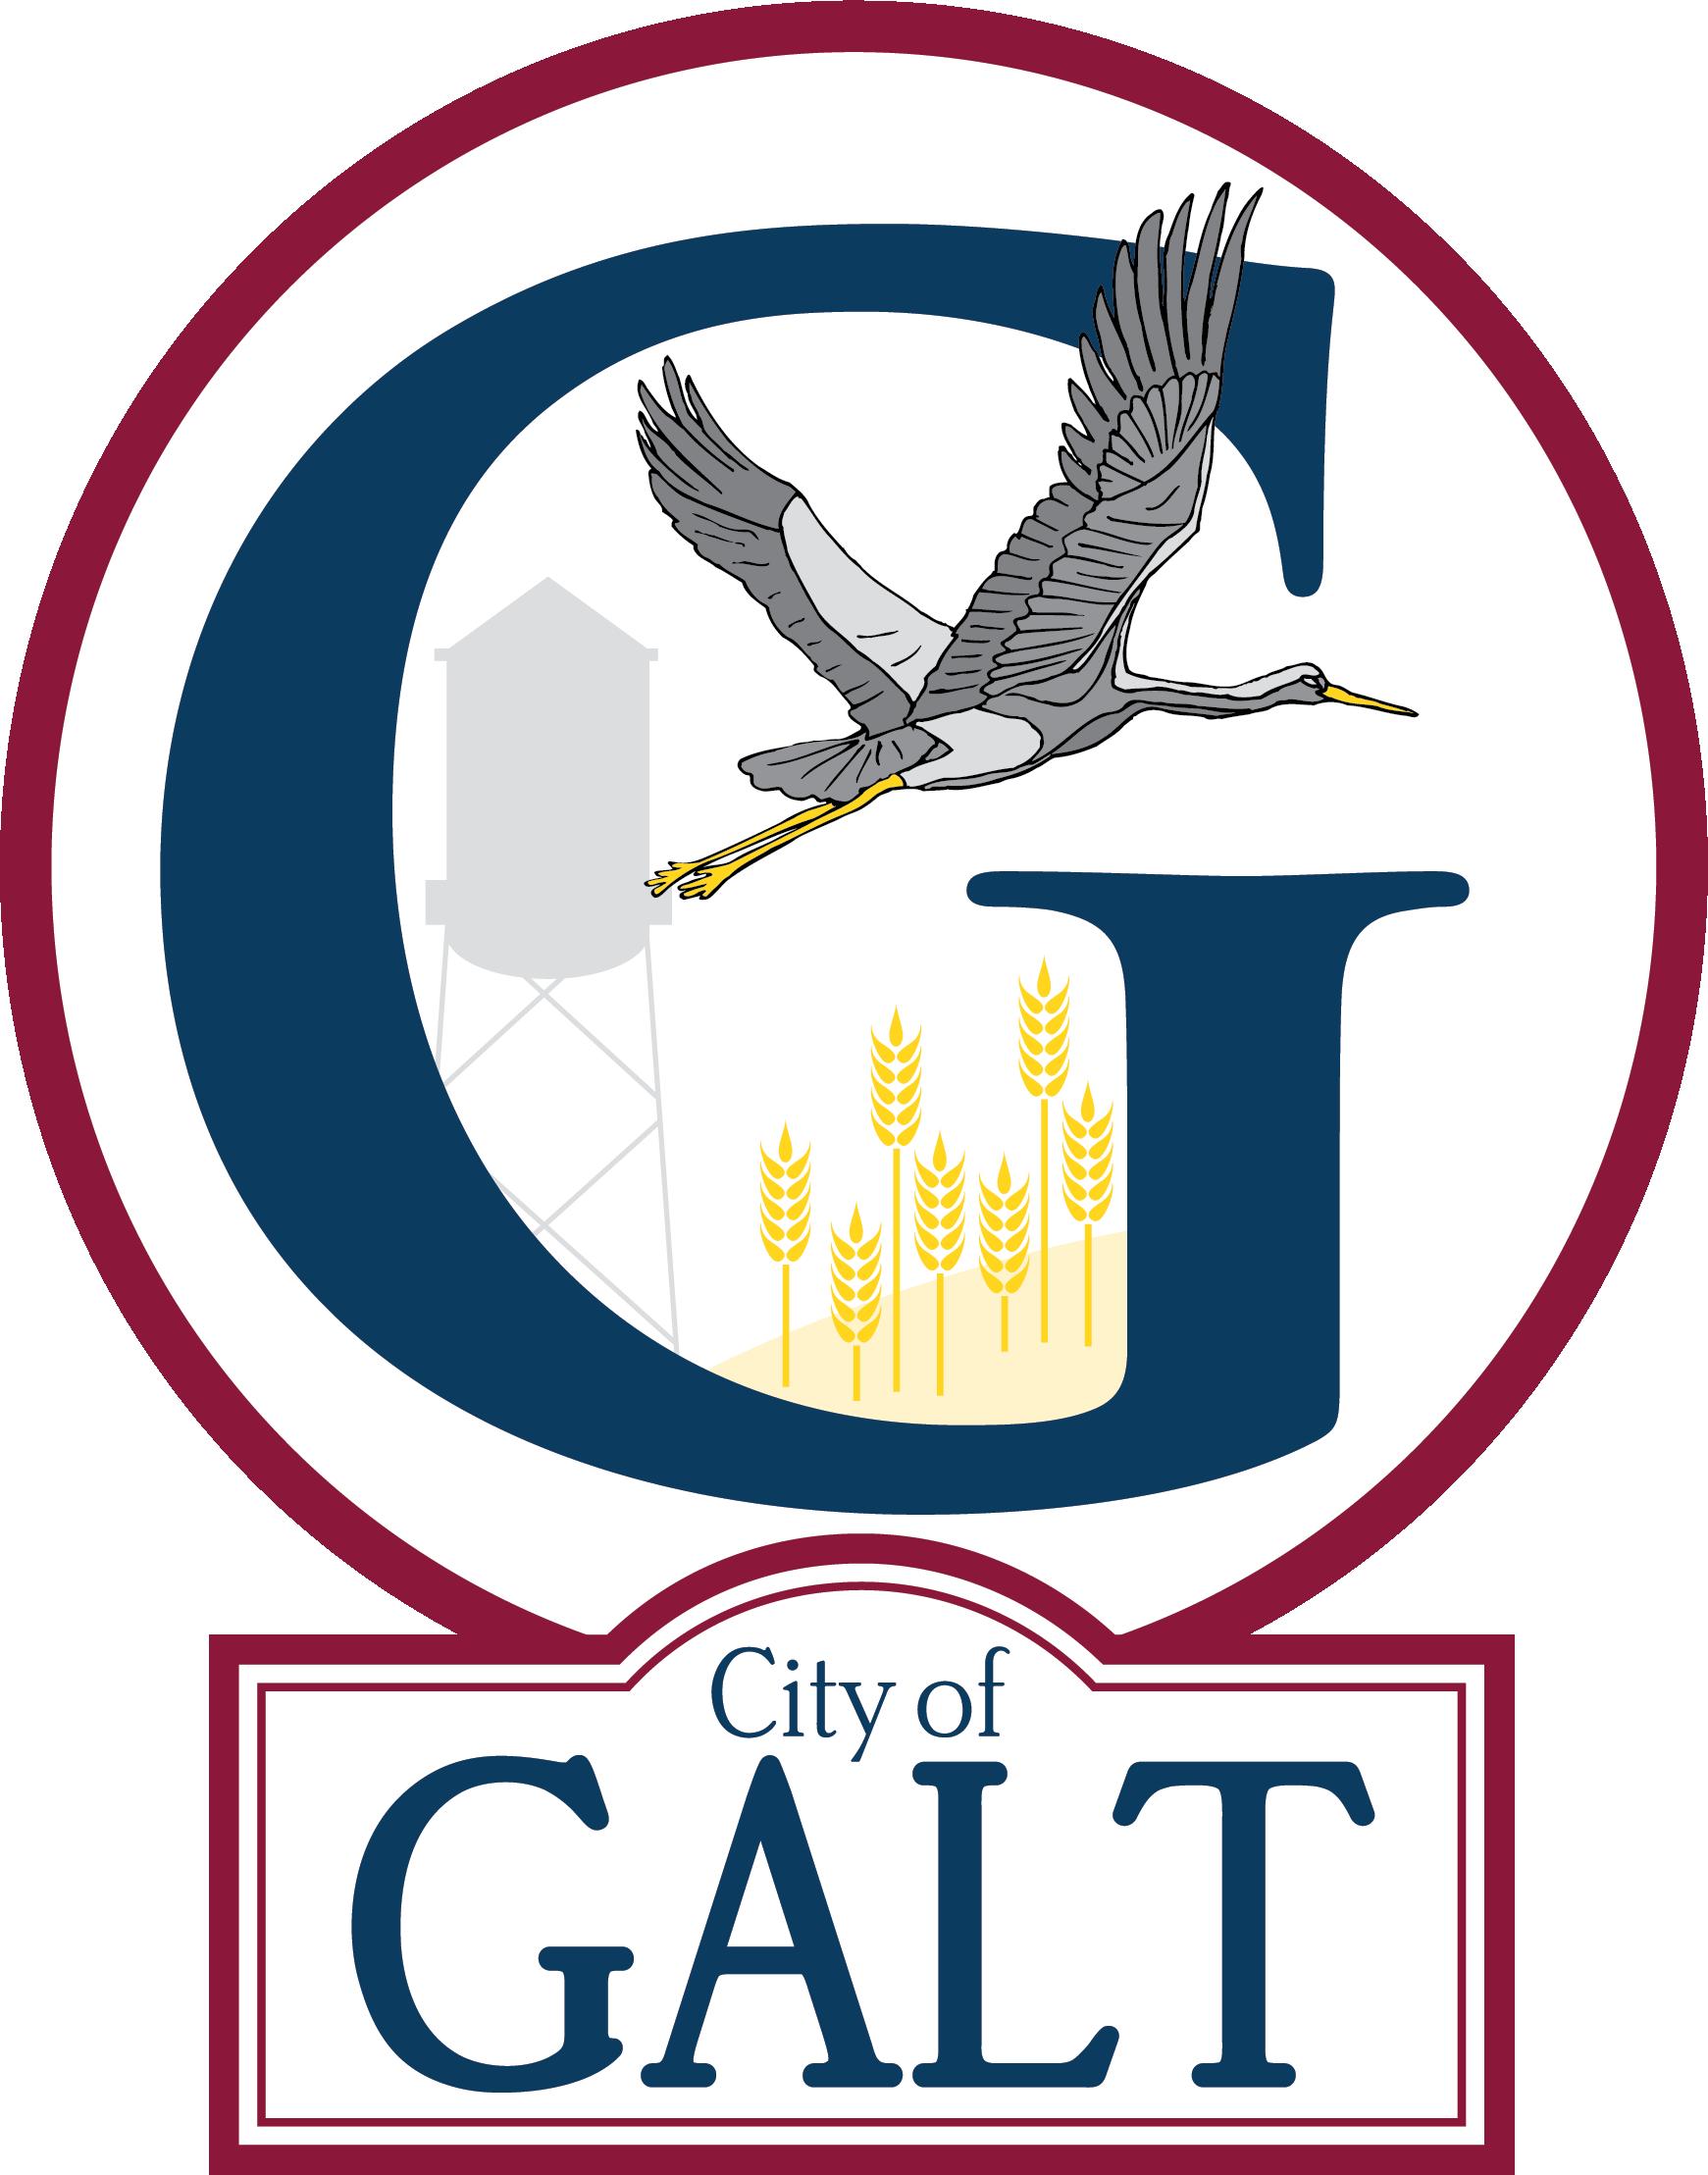 City of Galt logo